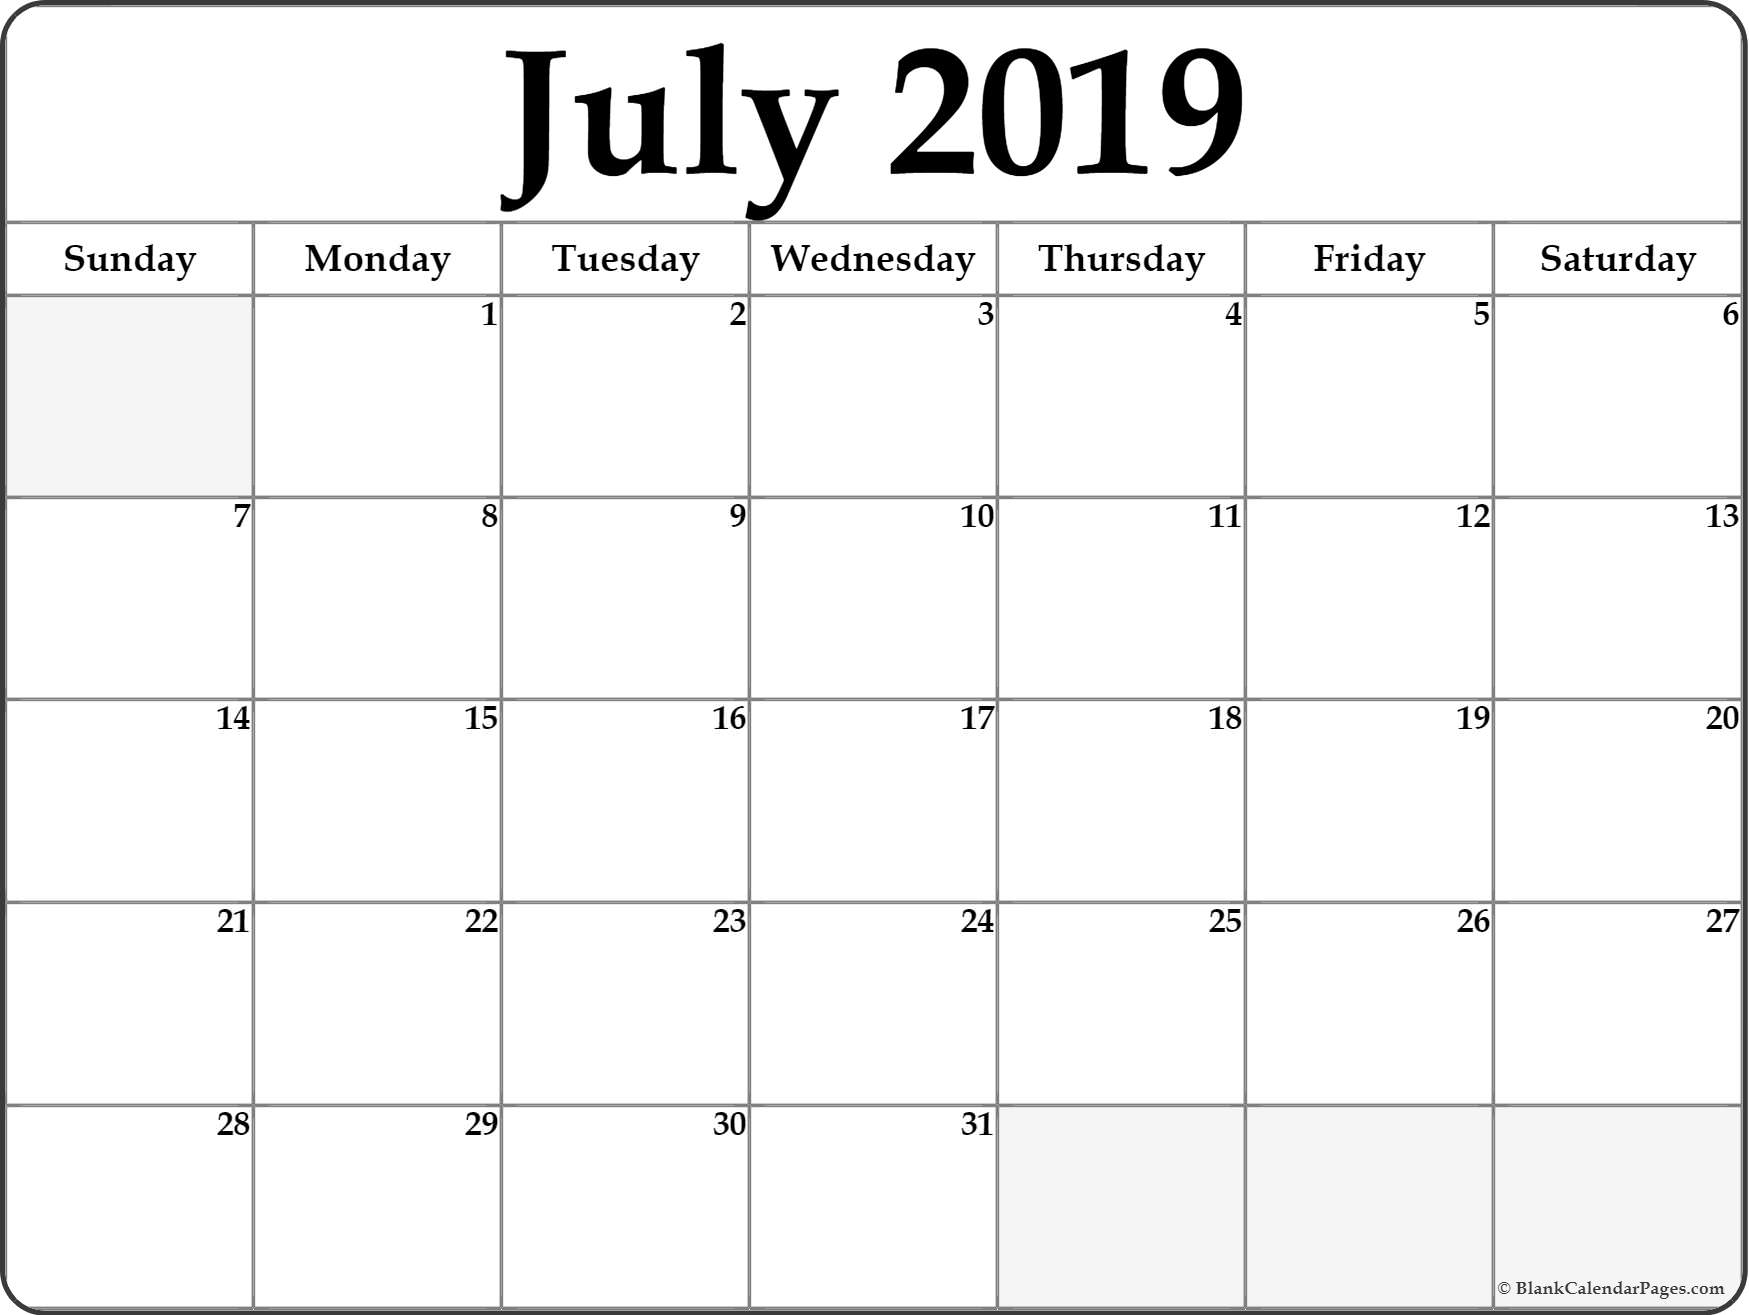 July 2019 Calendar | Free Printable Monthly Calendars with Blanket Calender Printables For December